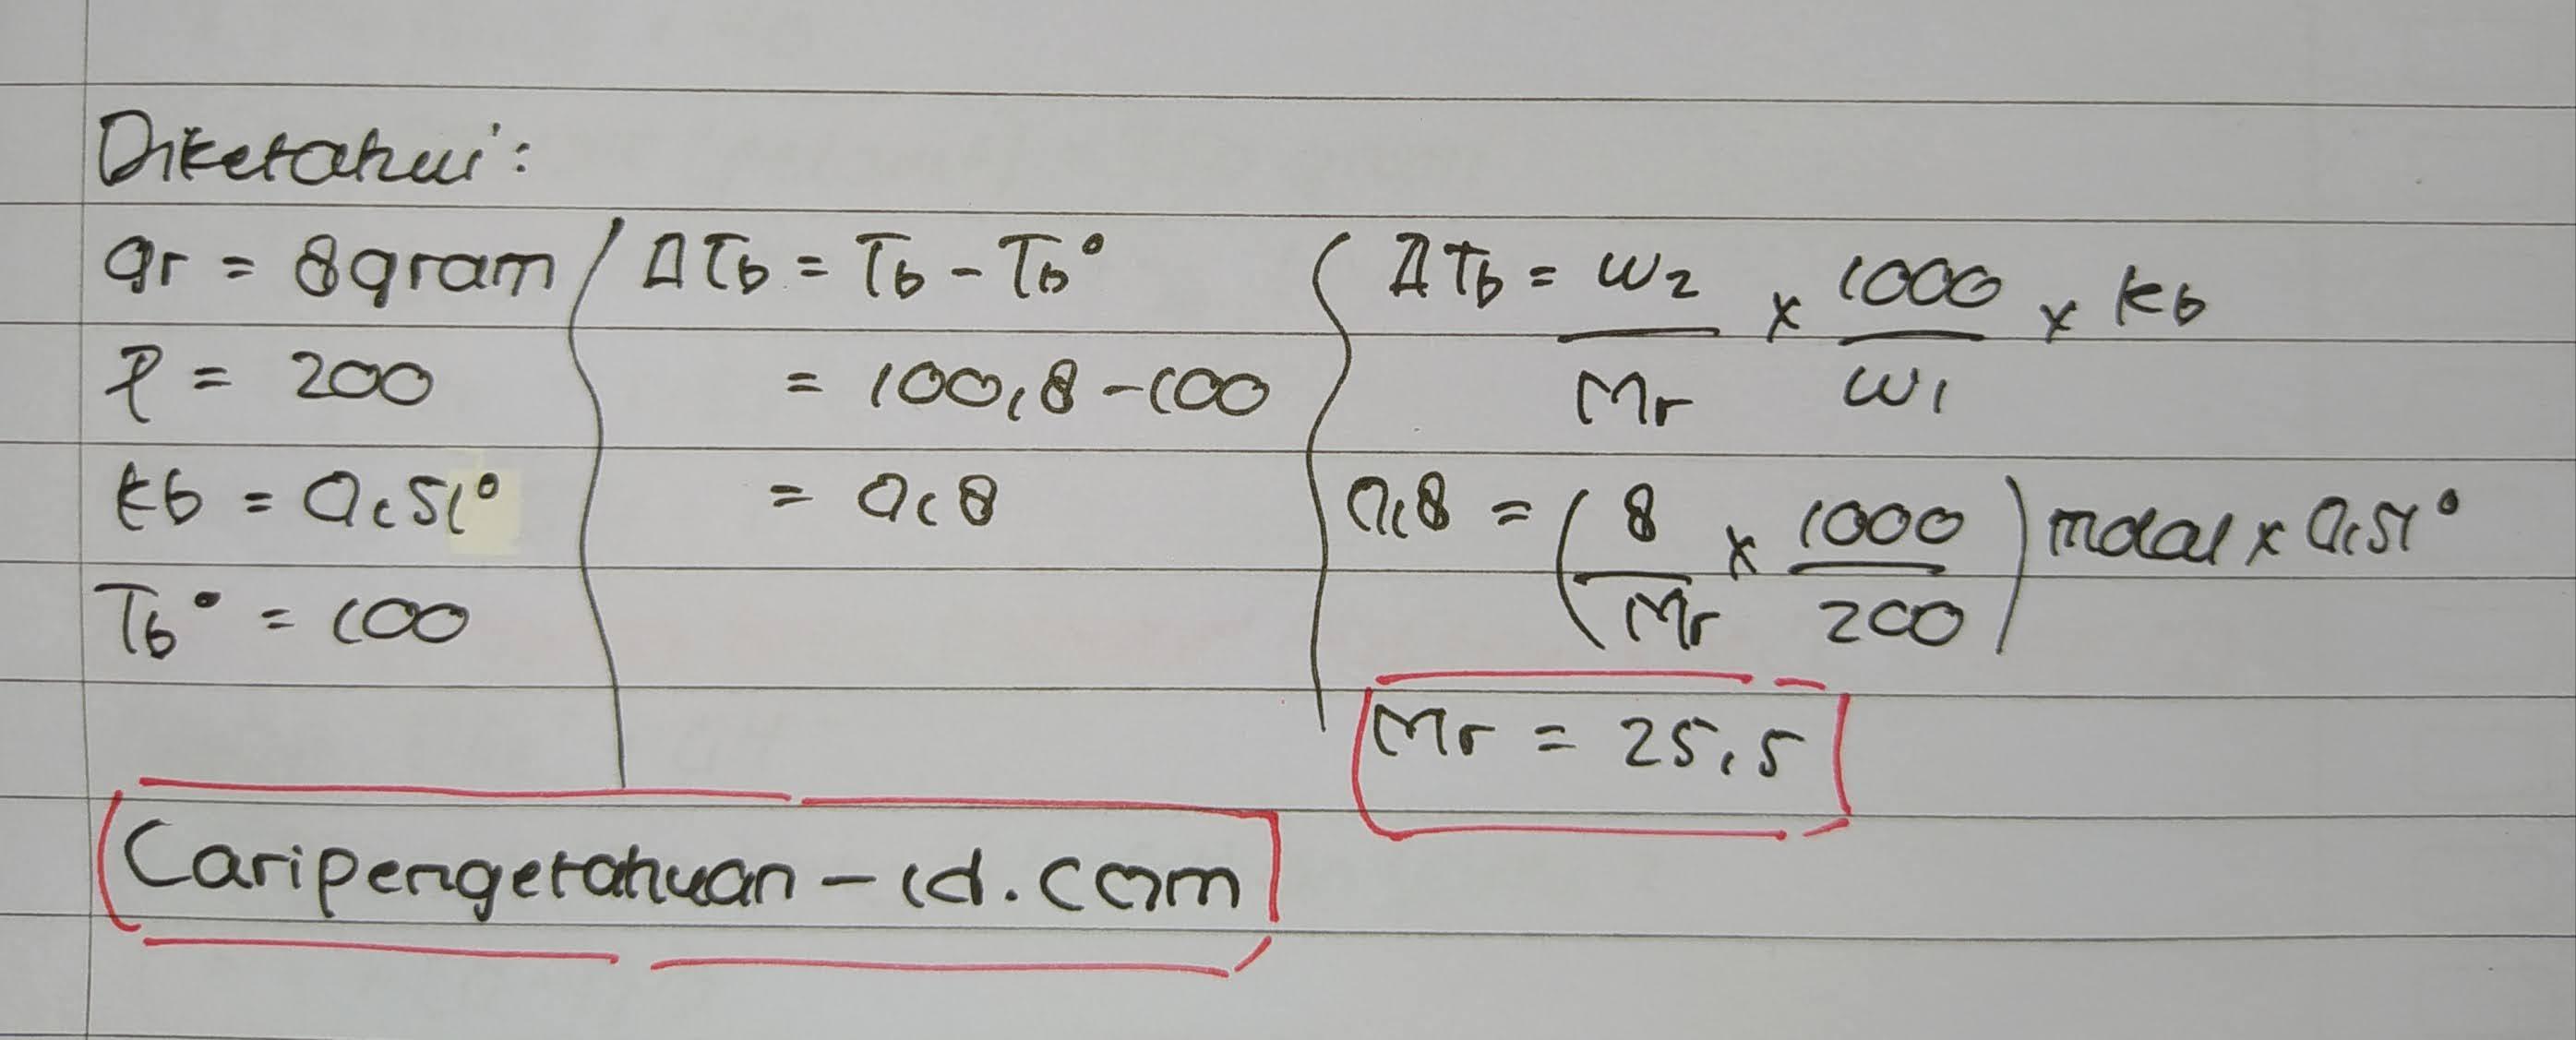 Suatu zat nonelektrolit yang massanya 8 gram dilarutkan dalam 200 gram air. Larutan itu mendidih pada temperatur 100,8°C. Maka Mr zat tersebut adalah....(Kb air = 0,51°C)